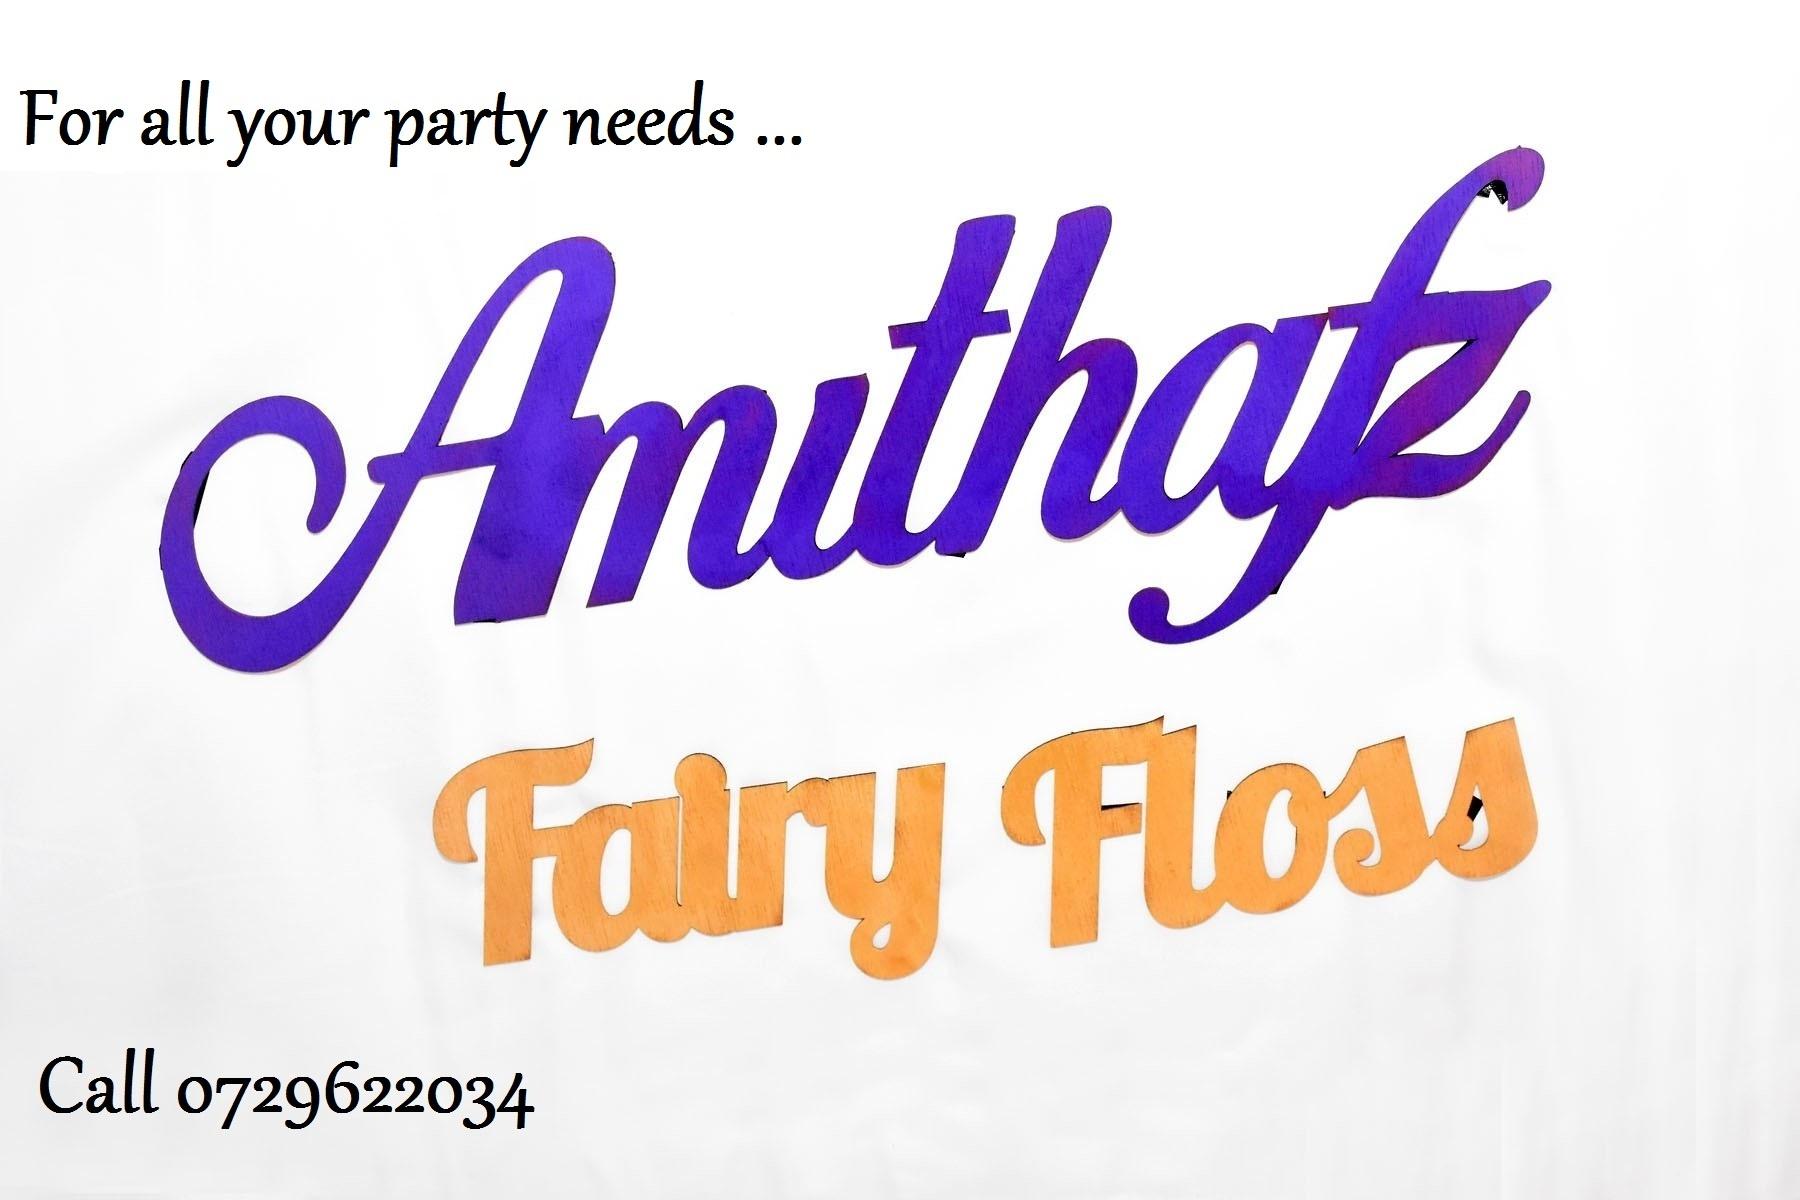 Amithafz FoodnTasty